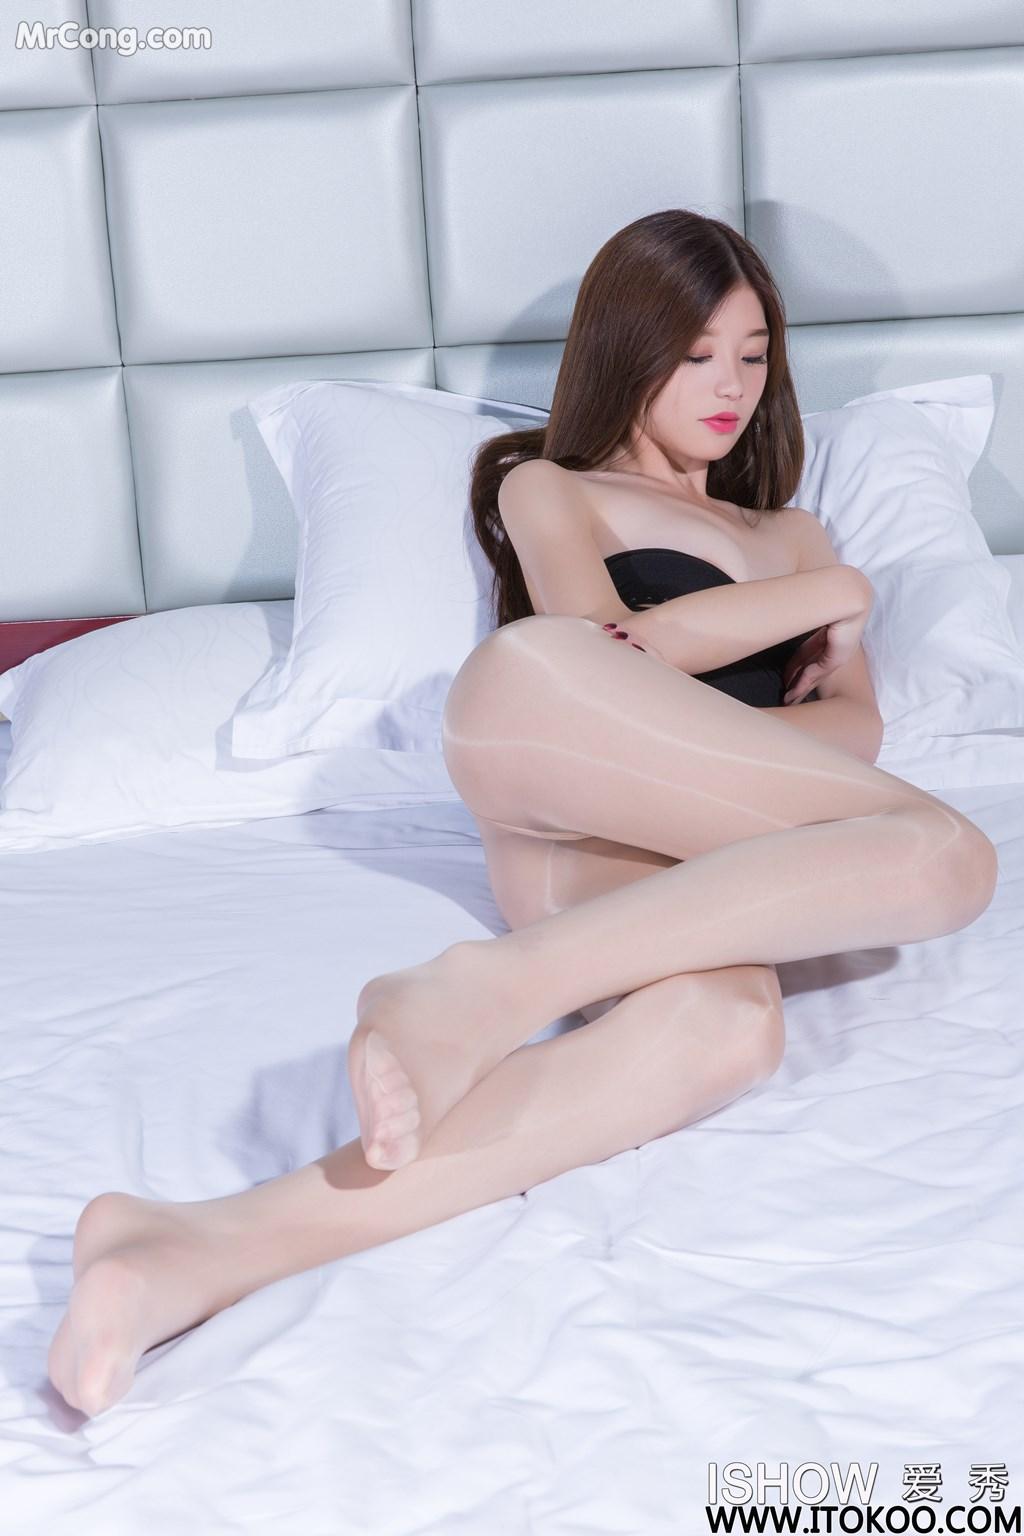 Image ISHOW-No.178-Liny-MrCong.com-008 in post ISHOW No.178: Người mẫu 林沐沐Liny (32 ảnh)